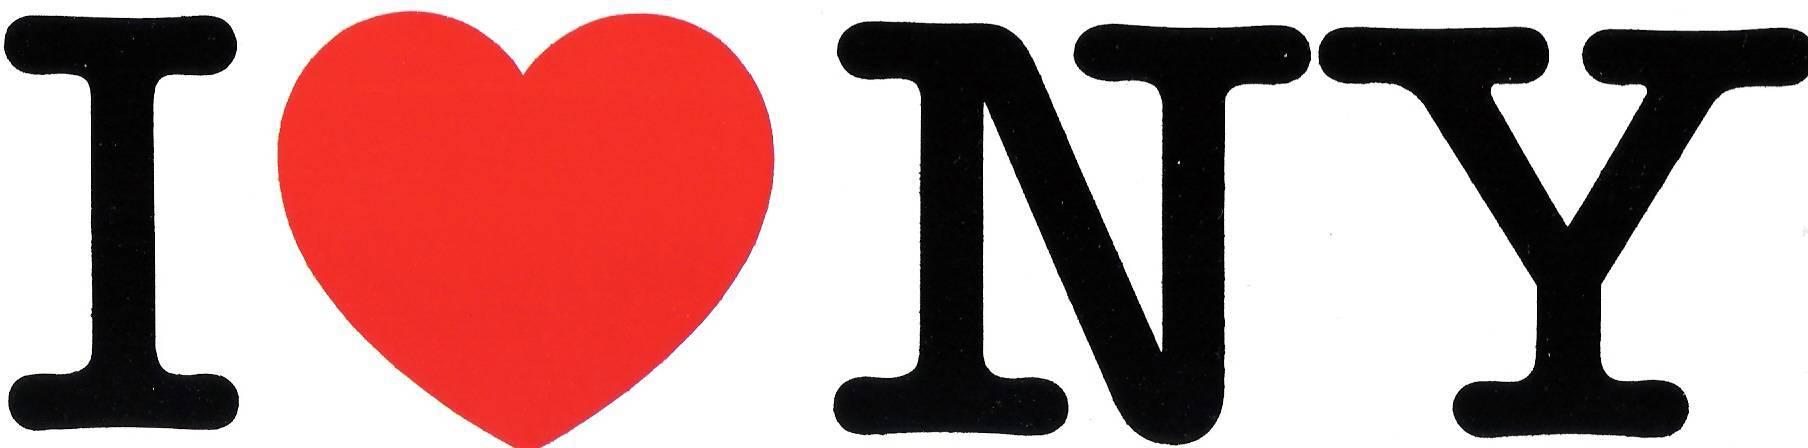 0b7f3641cf6b59caea95_I-Love-New-York-Logo.jpg